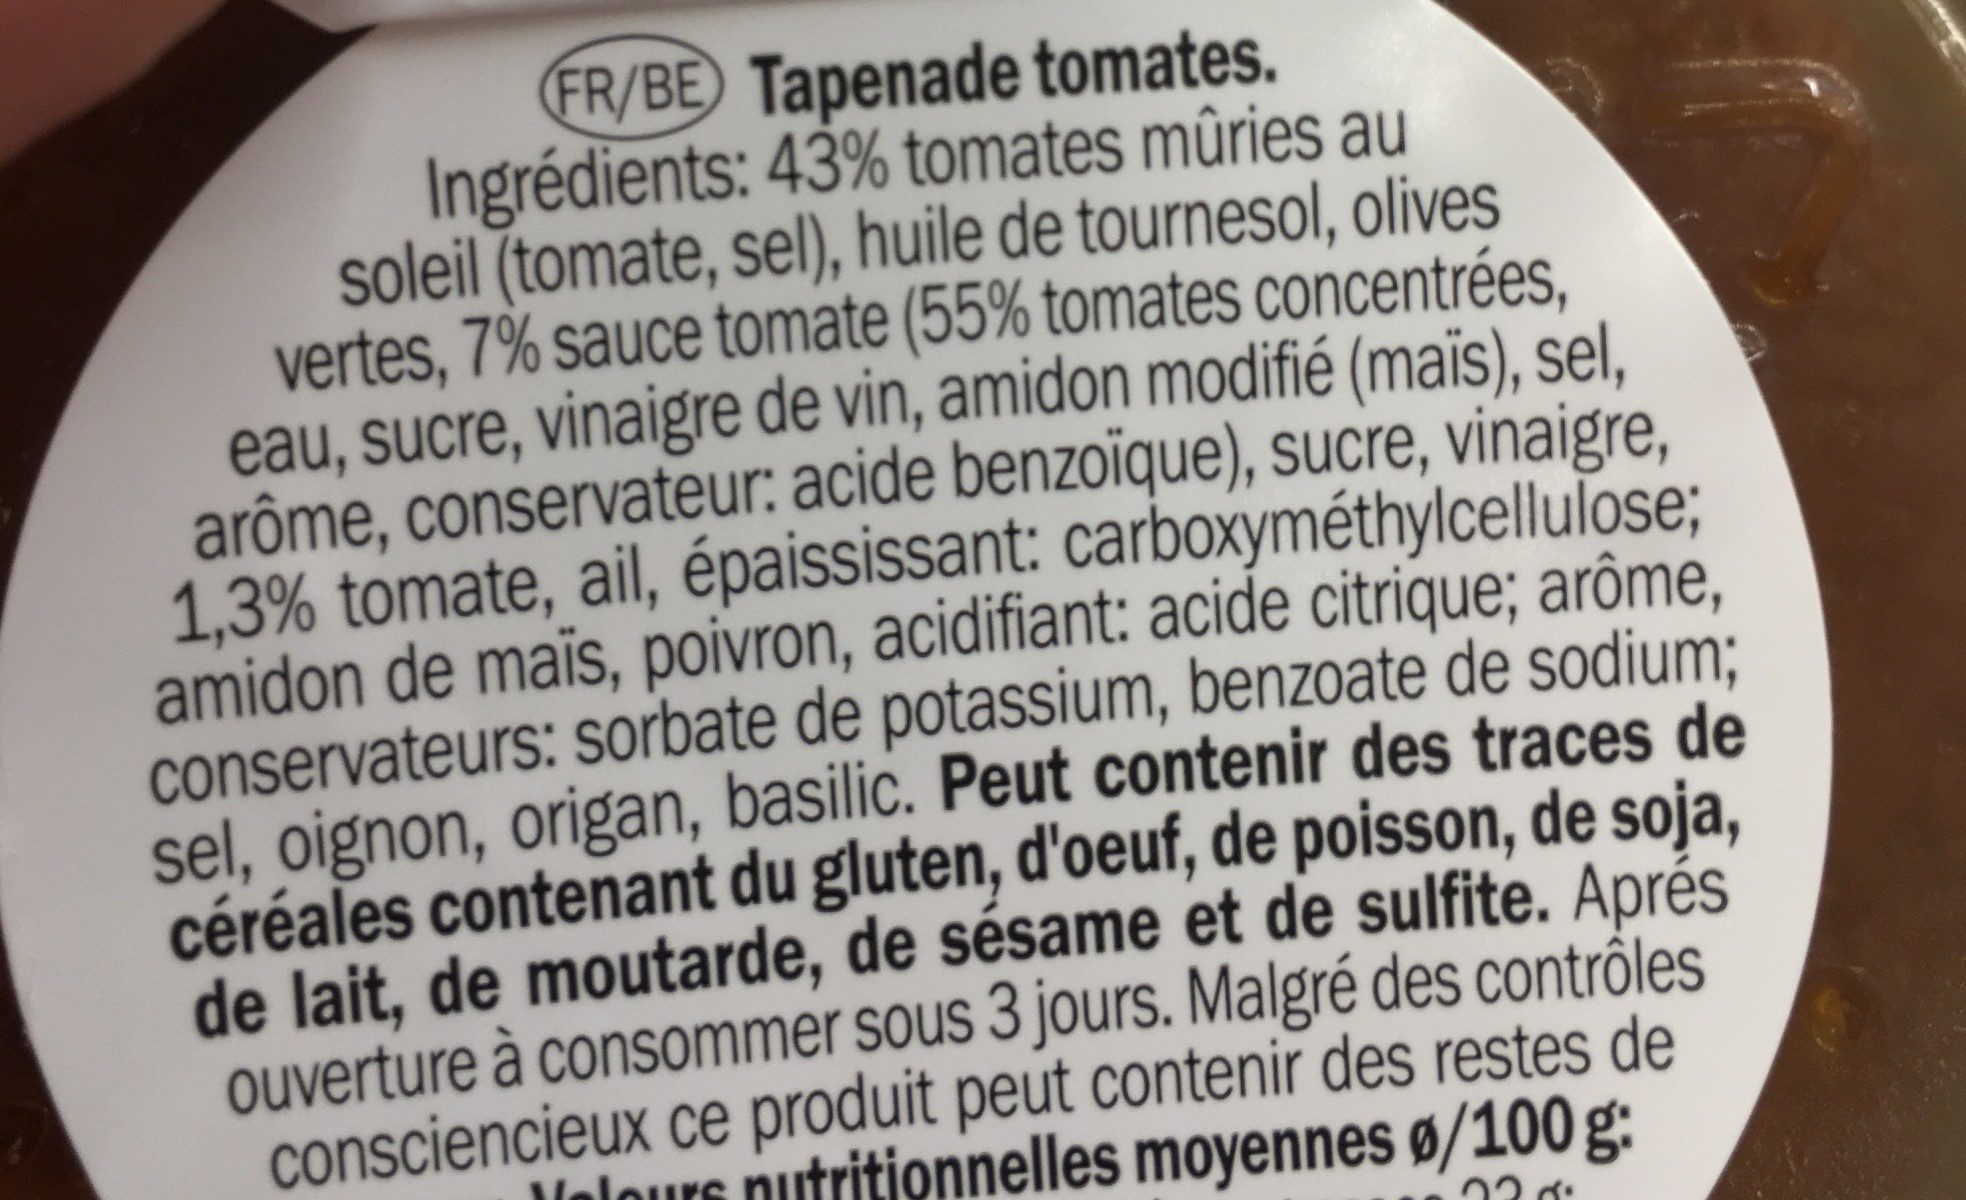 Tomatentapenade Bakje 150 Gram (baresa) Koeling - Ingrédients